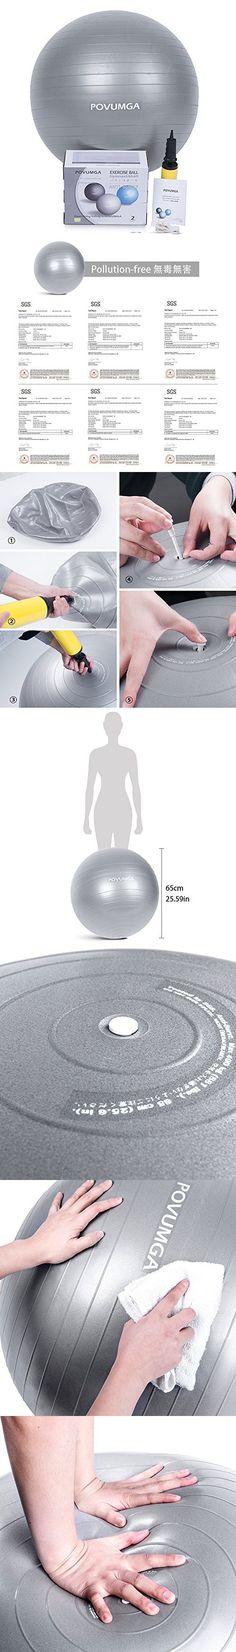 POVUMGA Exercise Balls 65cm Anti-Burst Balance Ball for Fitness, Core Stability, Yoga, Abdominal, Desk Chair, Pilates Training Birthing & Pregnancy Use Pump Included